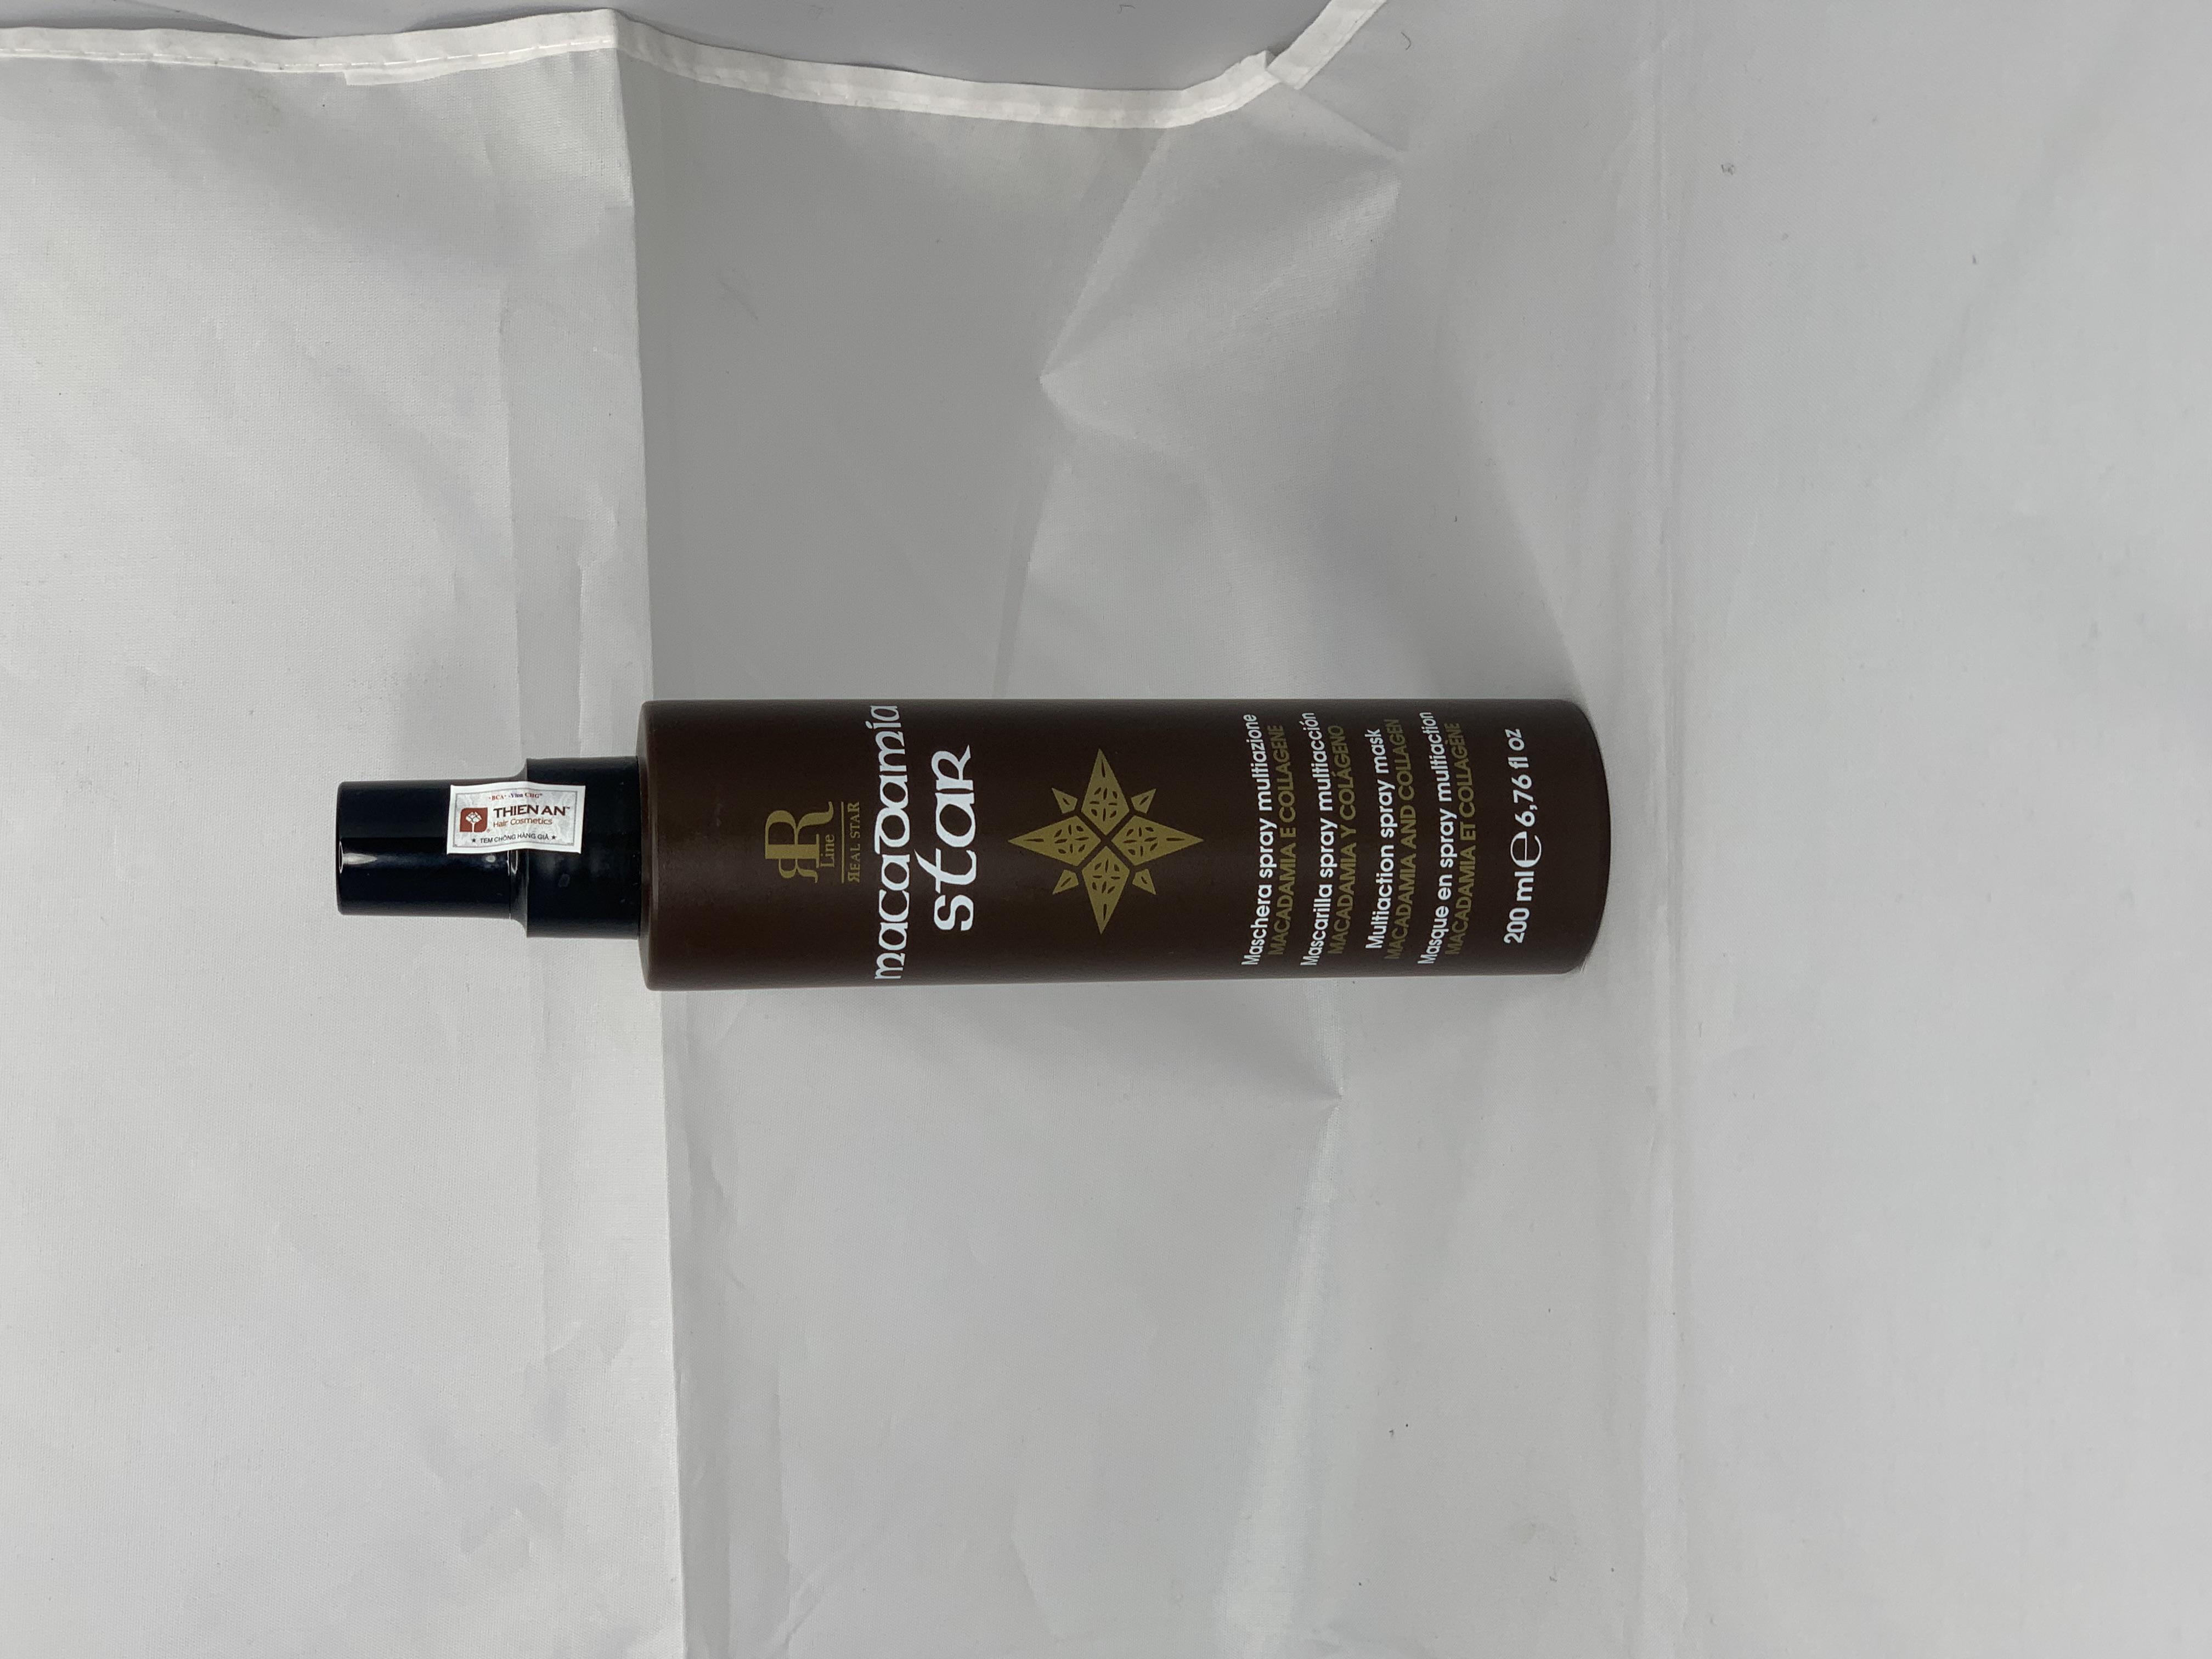 Xịt dưỡng phục hồi tóc xơ rối Rrline Macadamia Star Spray Mask 200ml